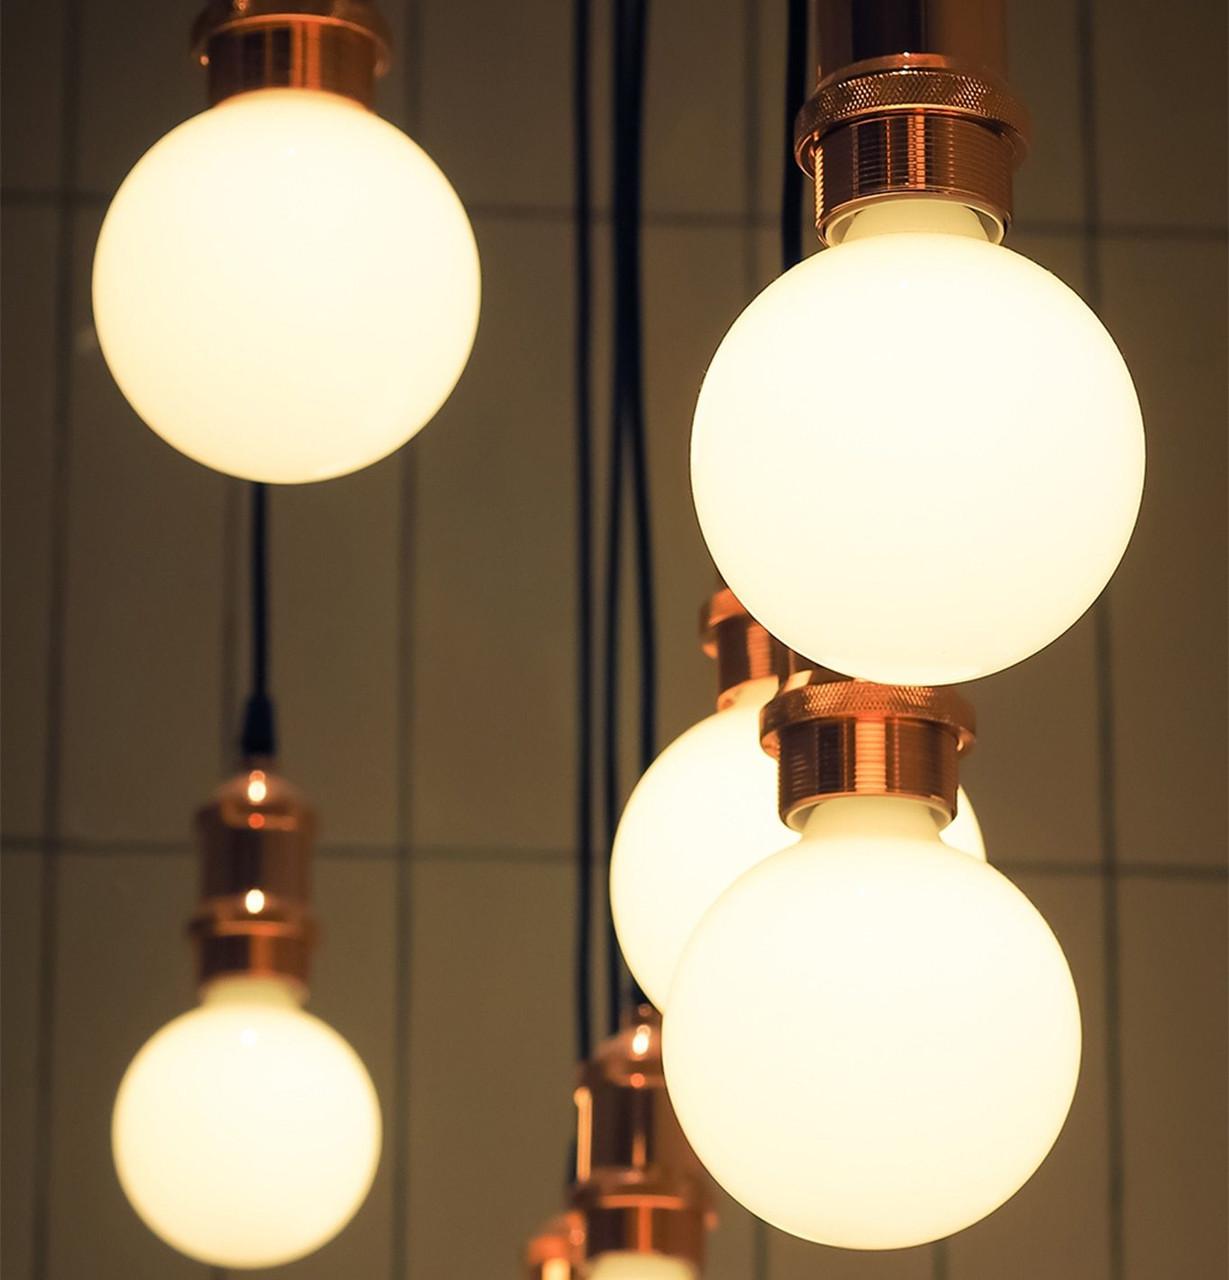 LED Dimmable Globe IP20 Light Bulbs